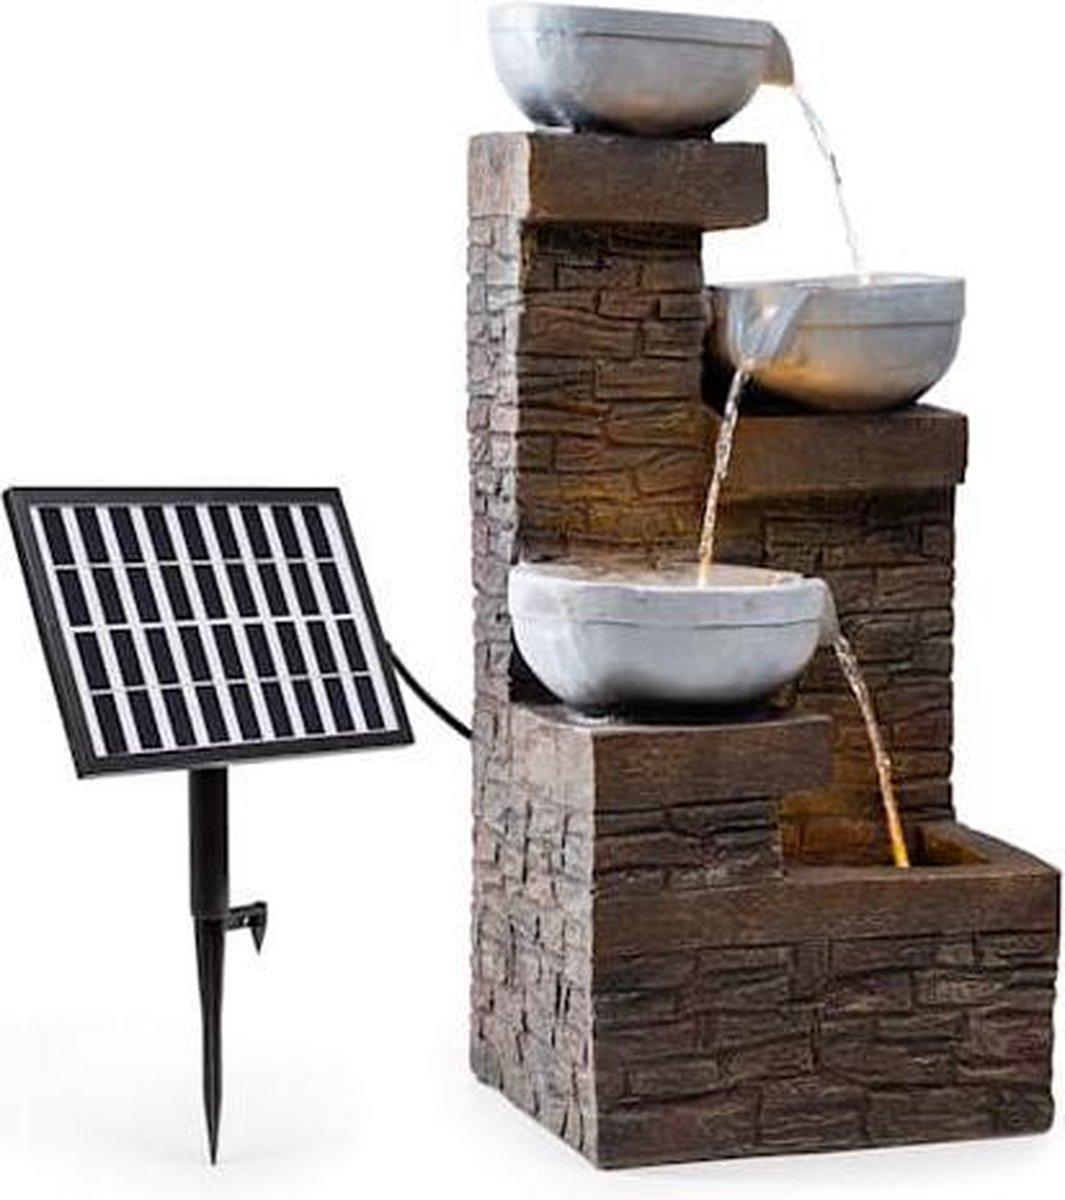 Blumfeldt Fez zonne-energie fontein - tuinfontein - LED- verlichting - 34 x 76 x 36 cm (BxHxD) - voor binnen en buiten - Polyresin